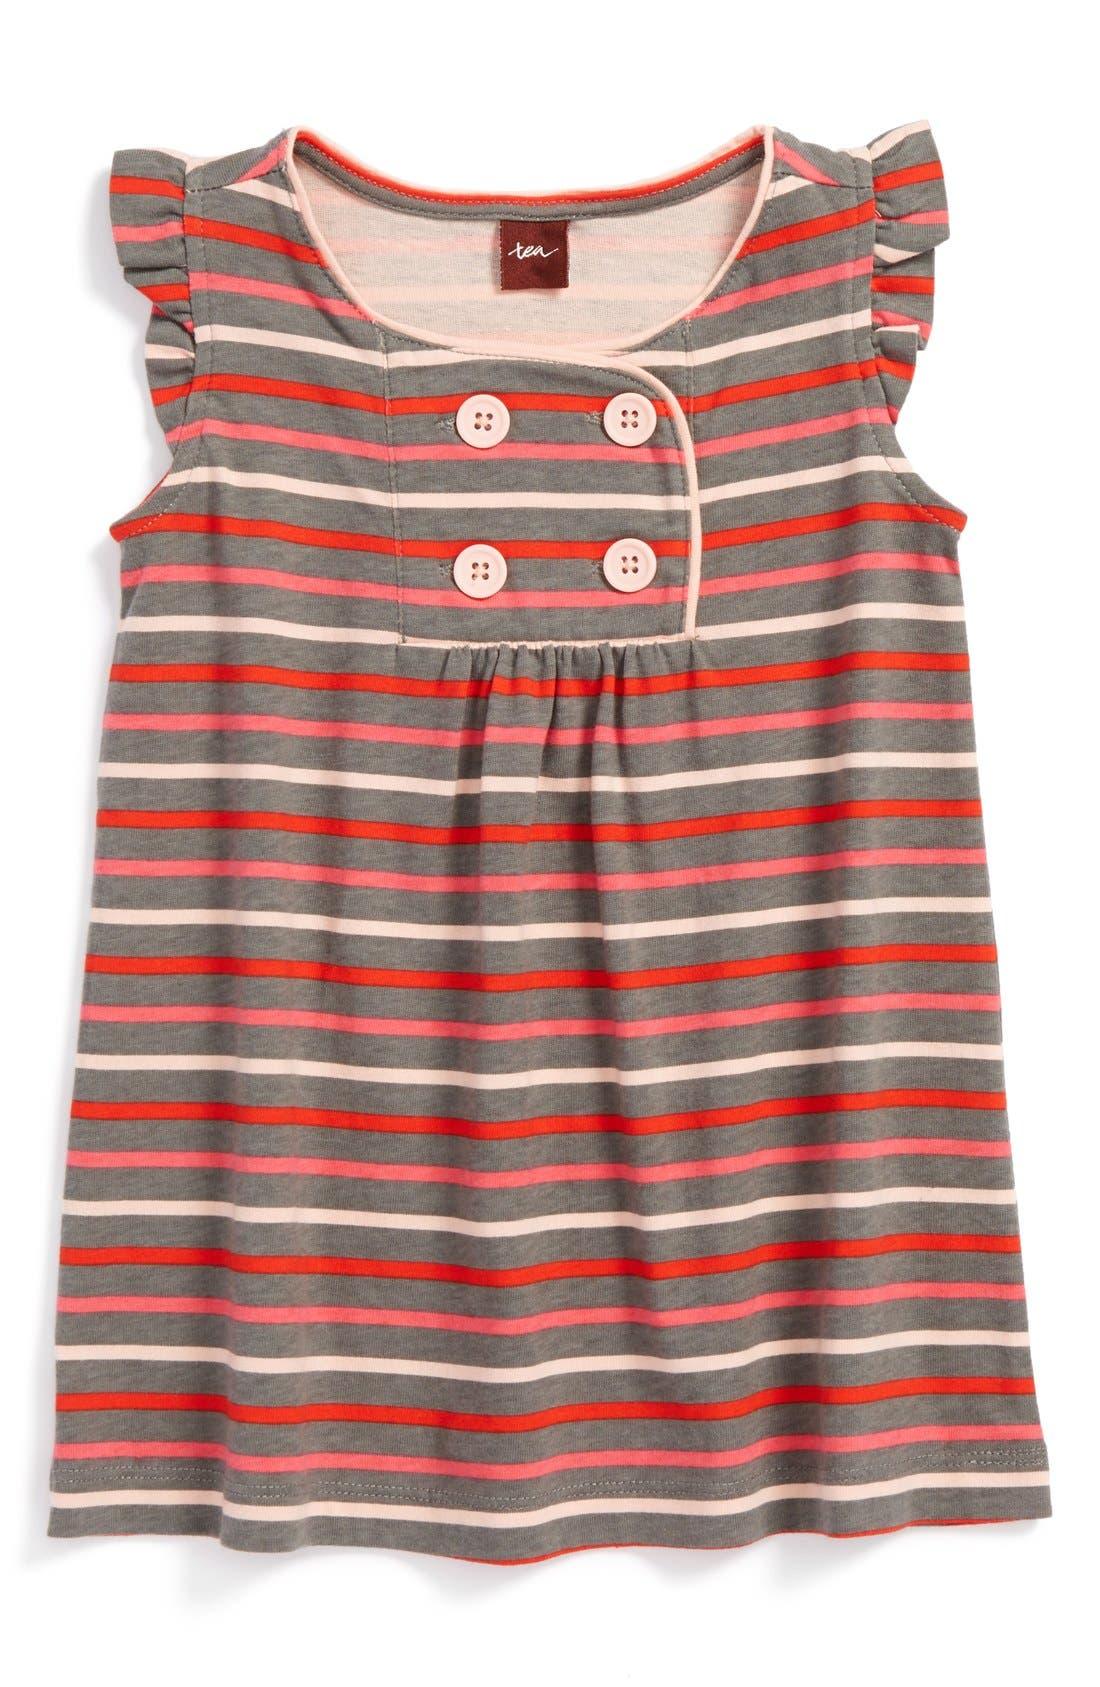 Alternate Image 1 Selected - Tea Collection 'Altstadt' Stripe Cotton Jersey Dress (Toddler Girls, Little Girls & Big Girls)